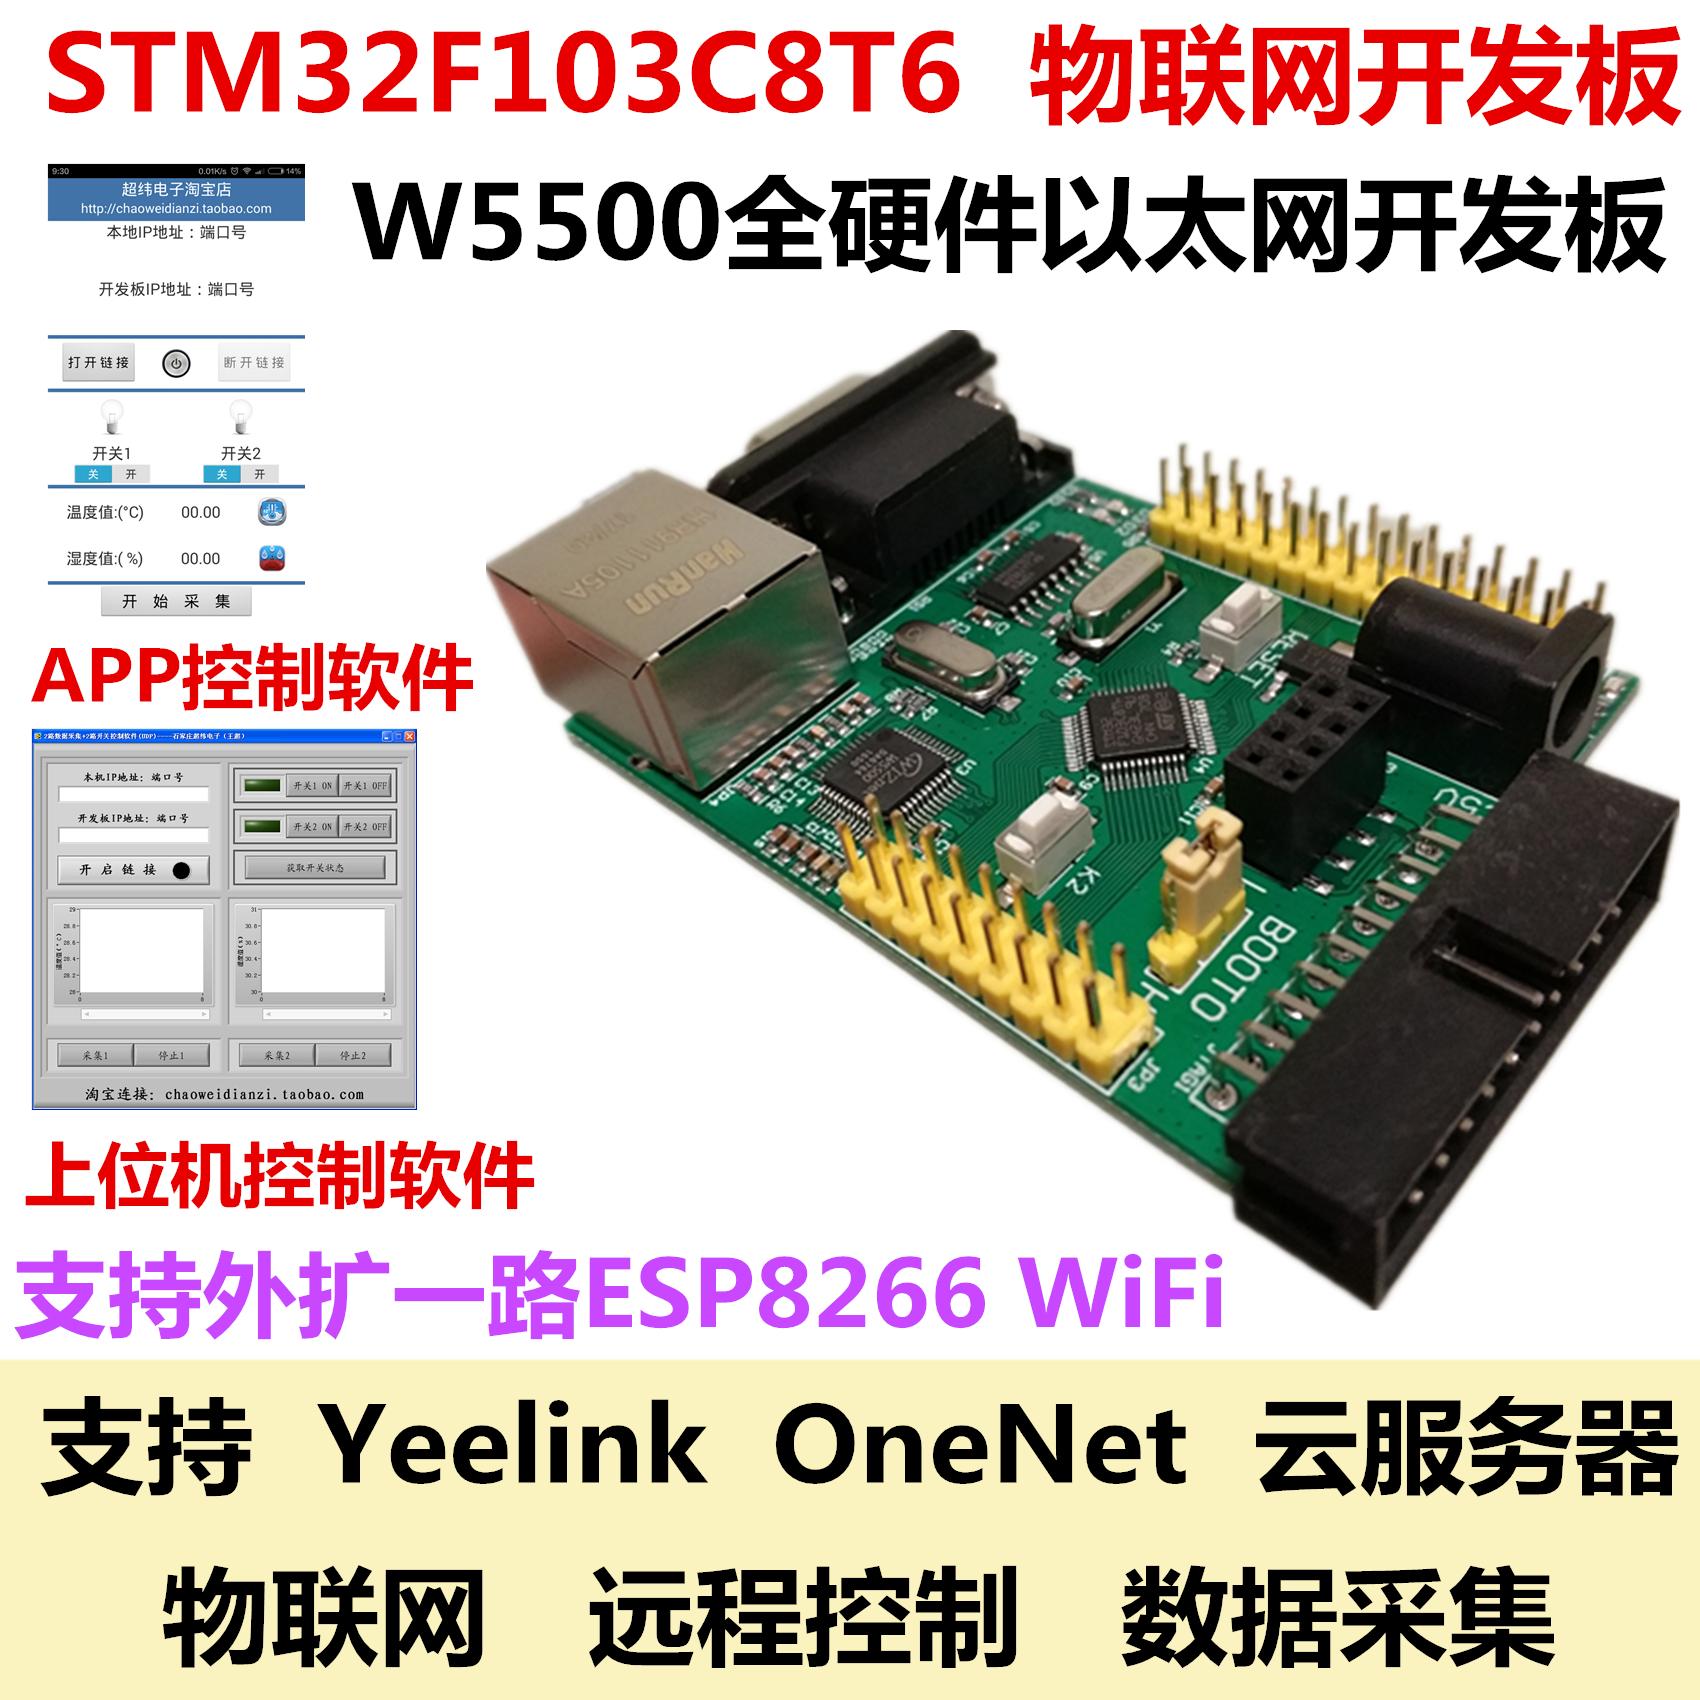 40 15] Internet of Things MQTT onenet Aliyun STM32 W5500